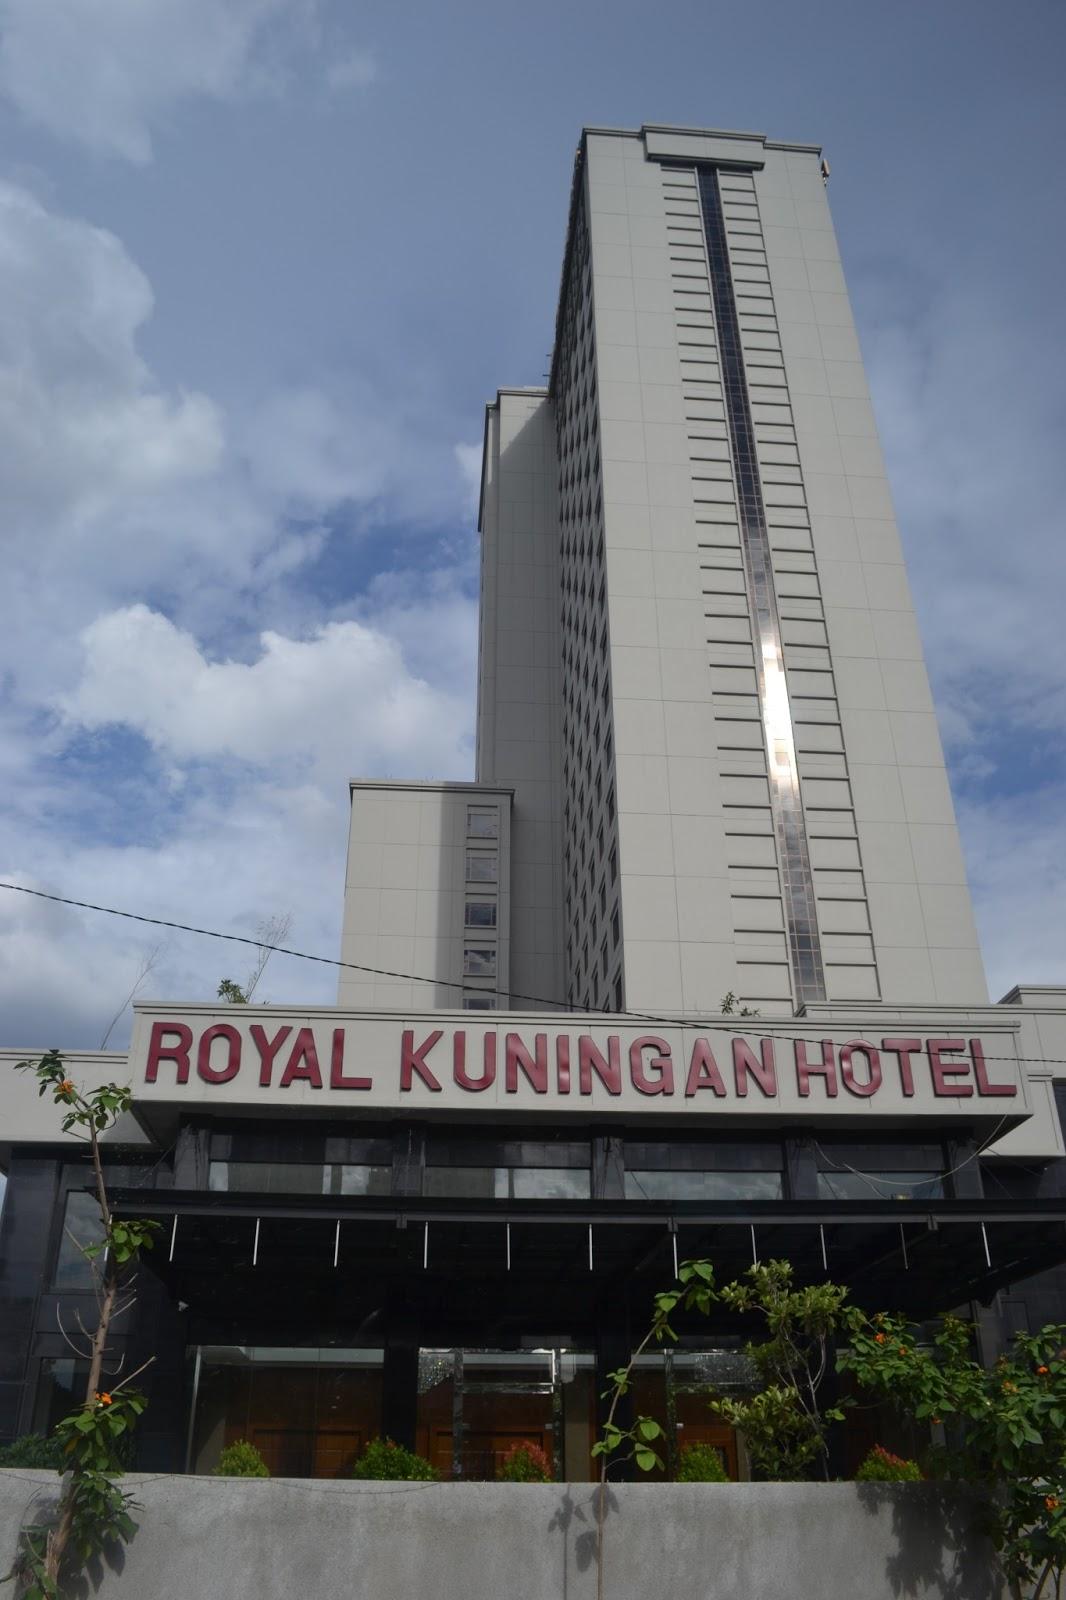 Royal kuningan hotel in jakarta the freudian slip of a for Hotel royal